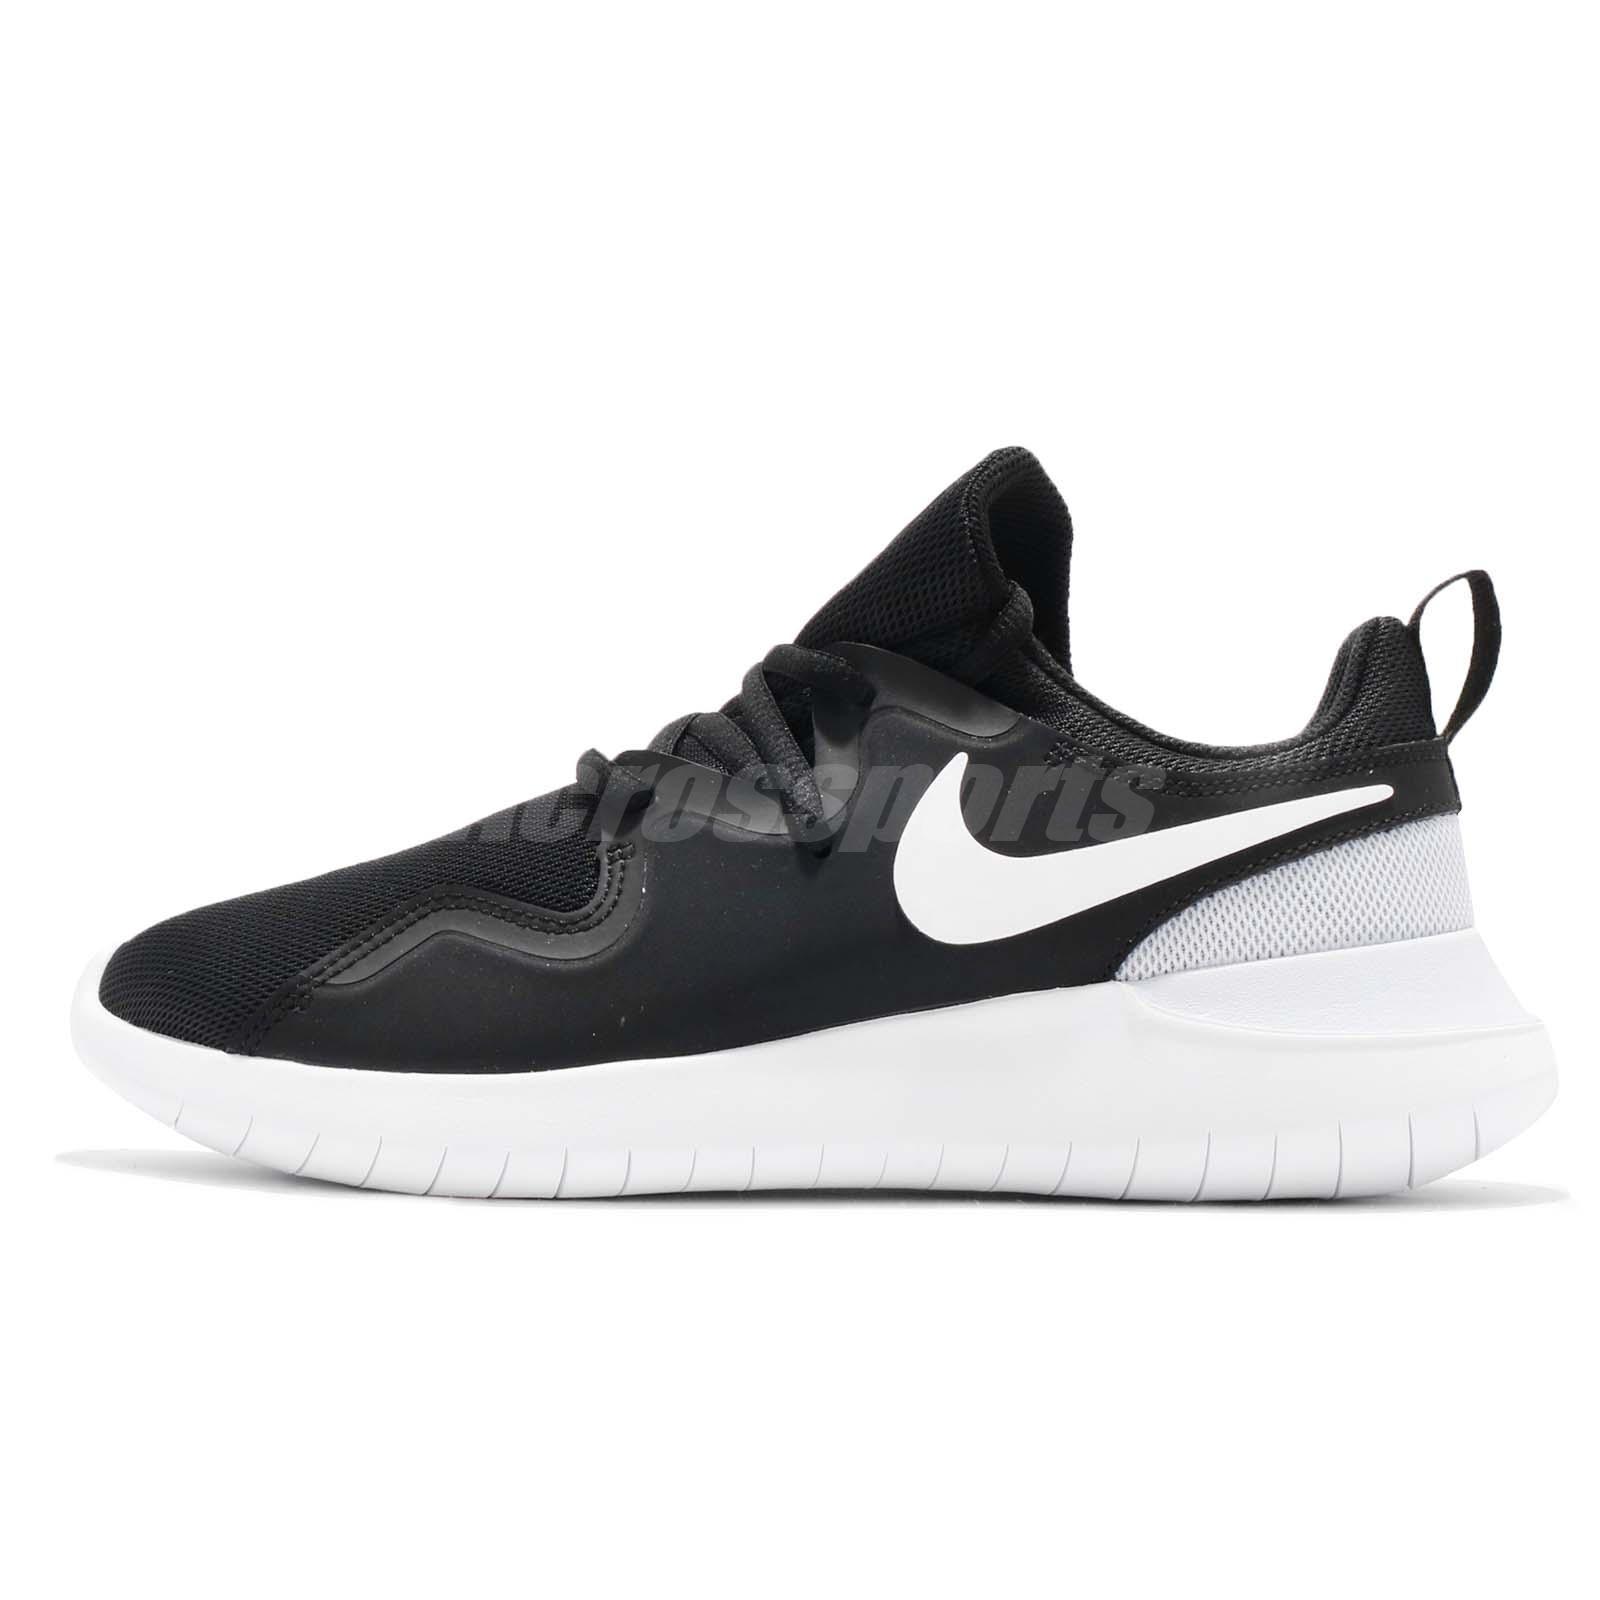 low priced e9fab cdecd Wmns Nike Tessen Black White Pure Platinum Women Running Shoe Sneaker  AA2172-001